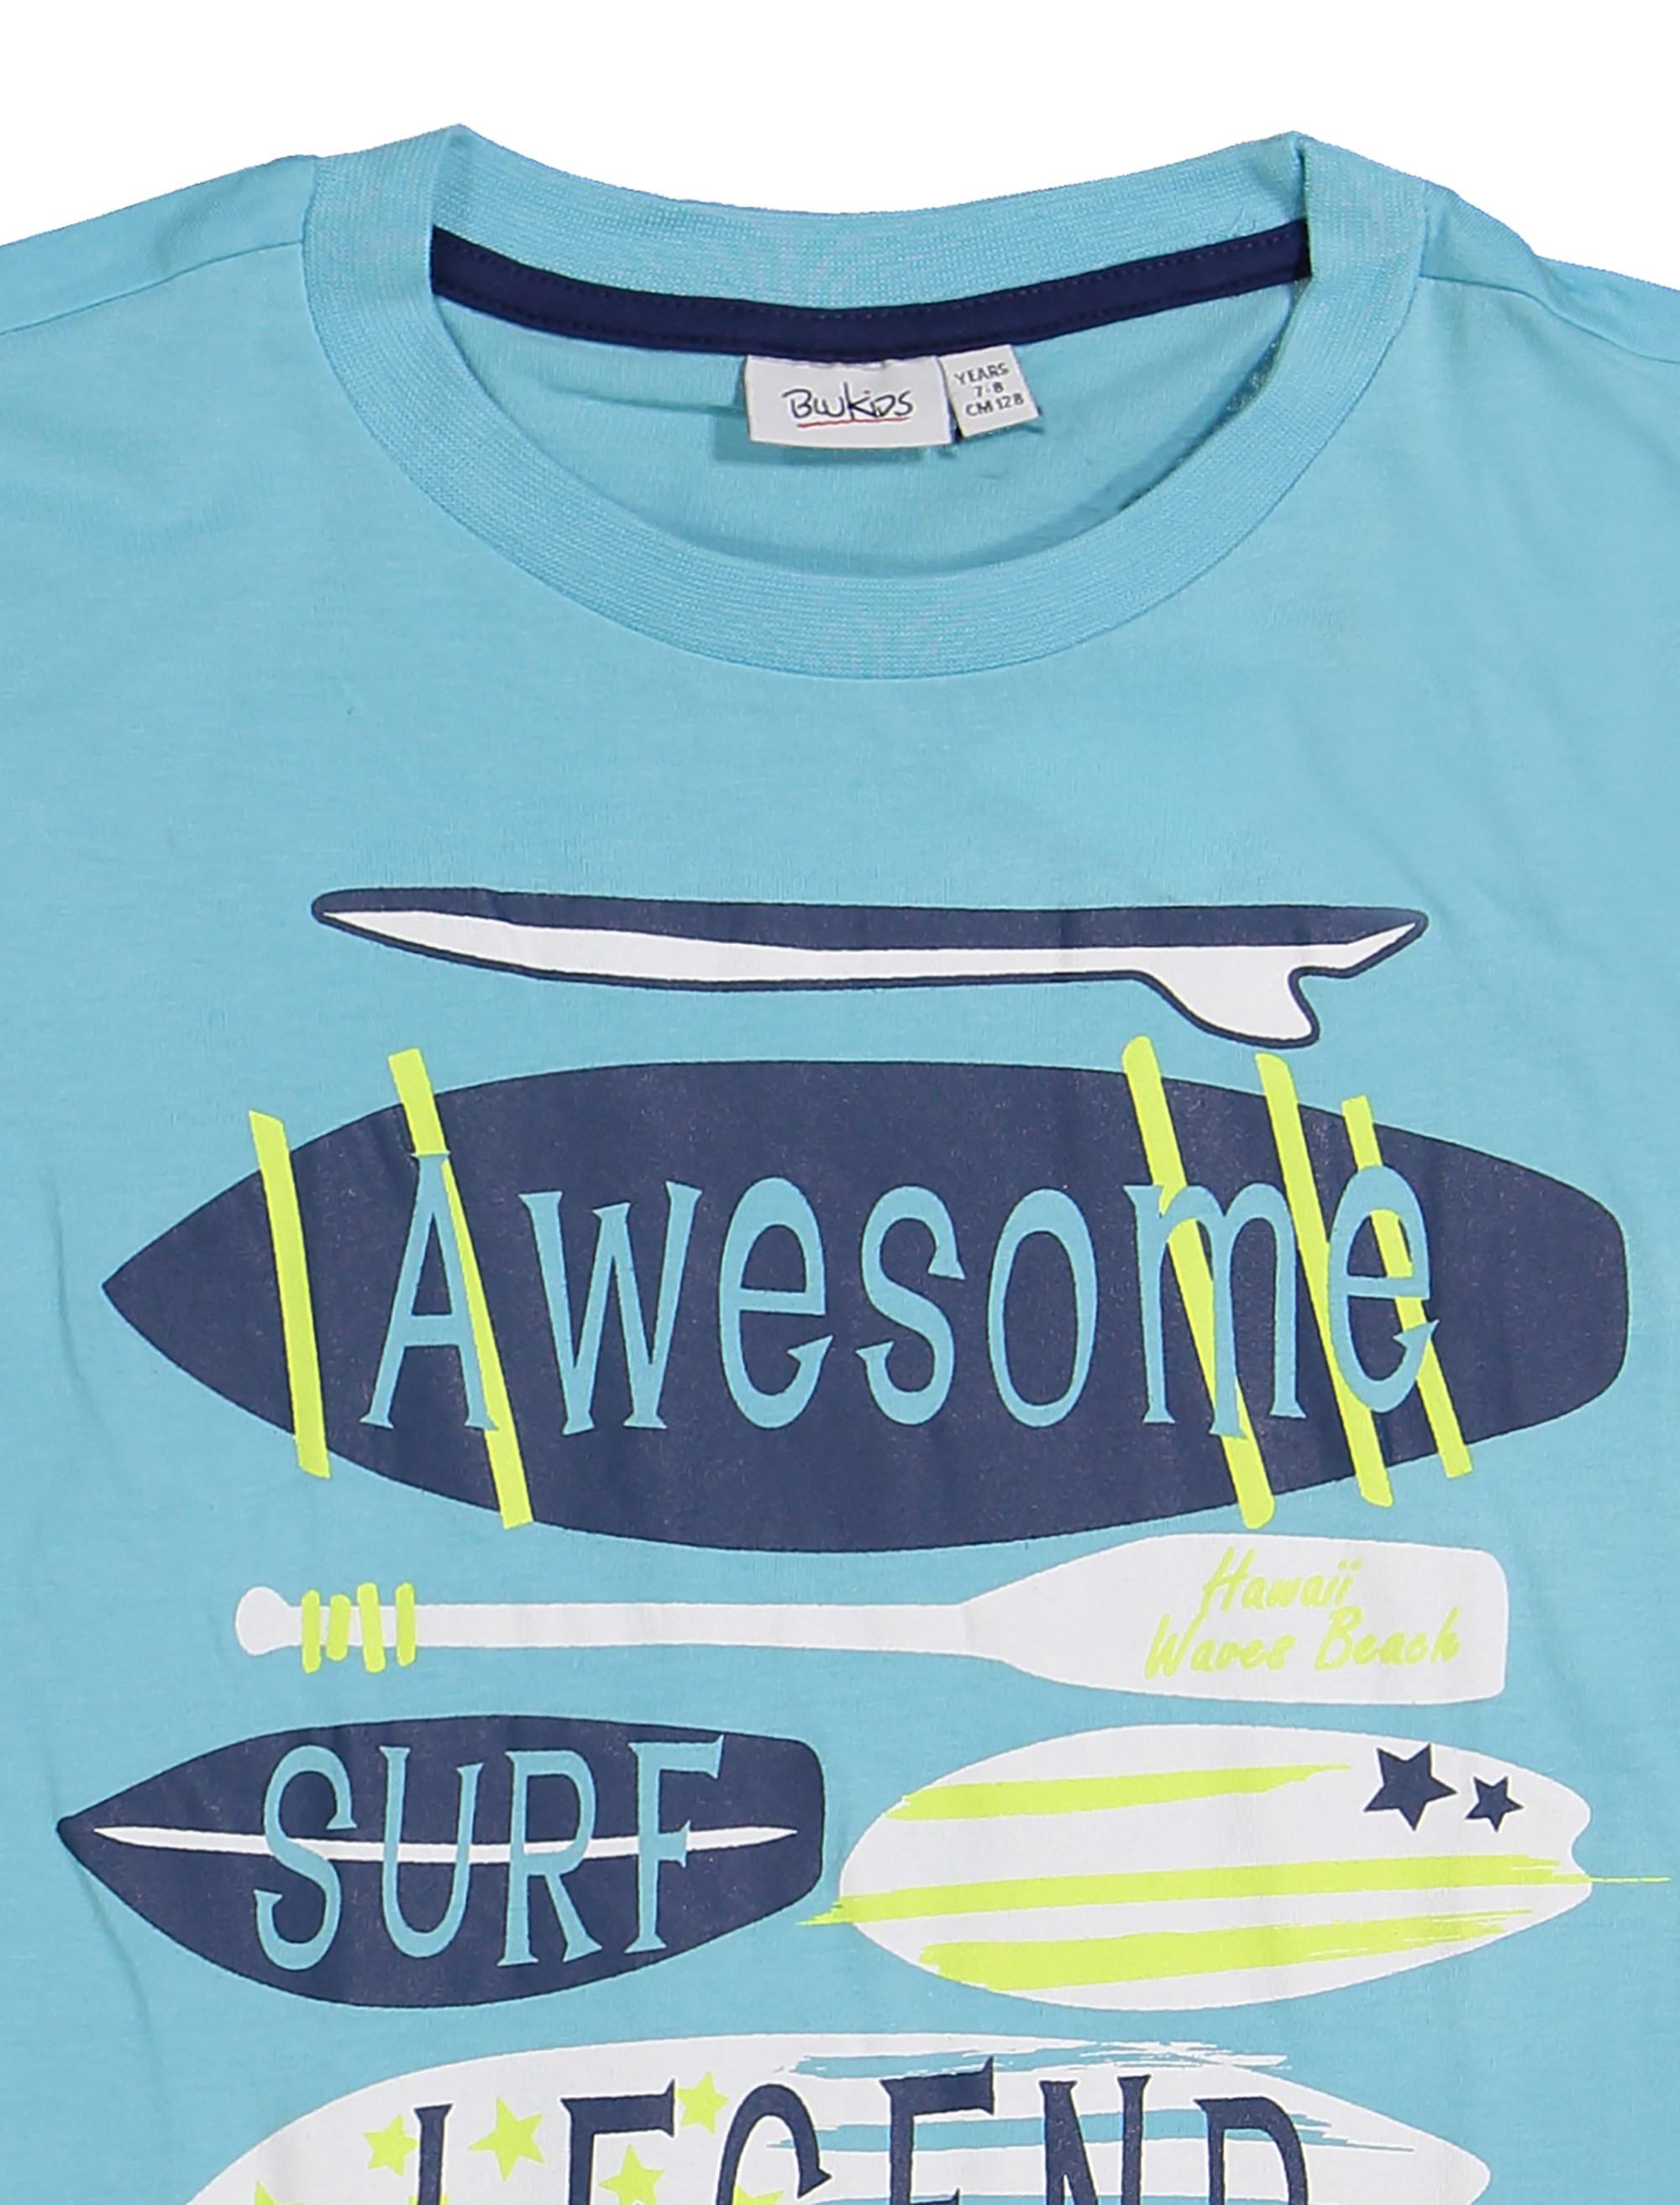 تی شرت و شلوارک نخی پسرانه - بلوکیدز - آبي/سفيد - 4